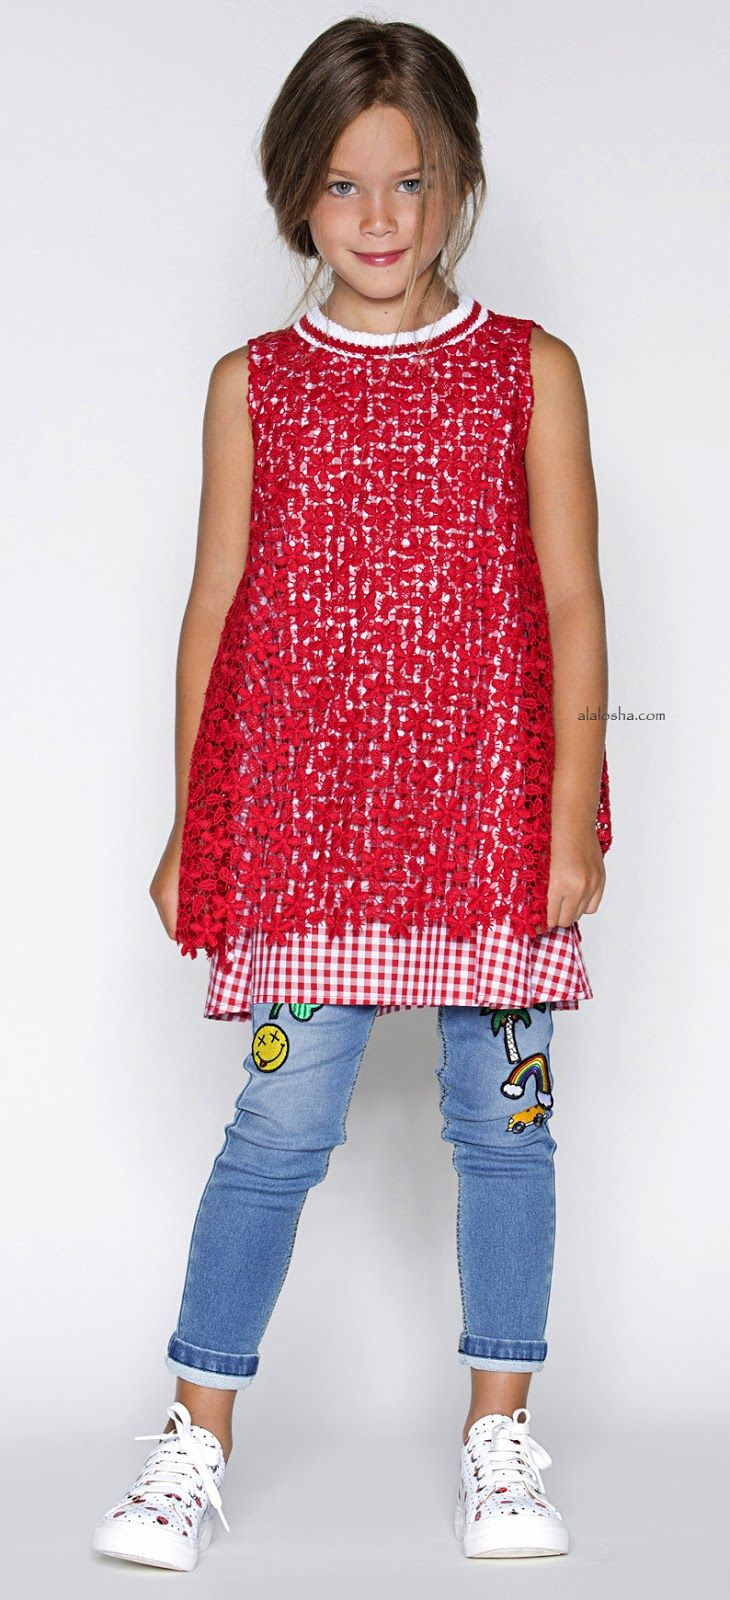 ALALOSHA: VOGUE ENFANTS: Must Have of the Day: Ermanno Scervino SS17 embroidered denim